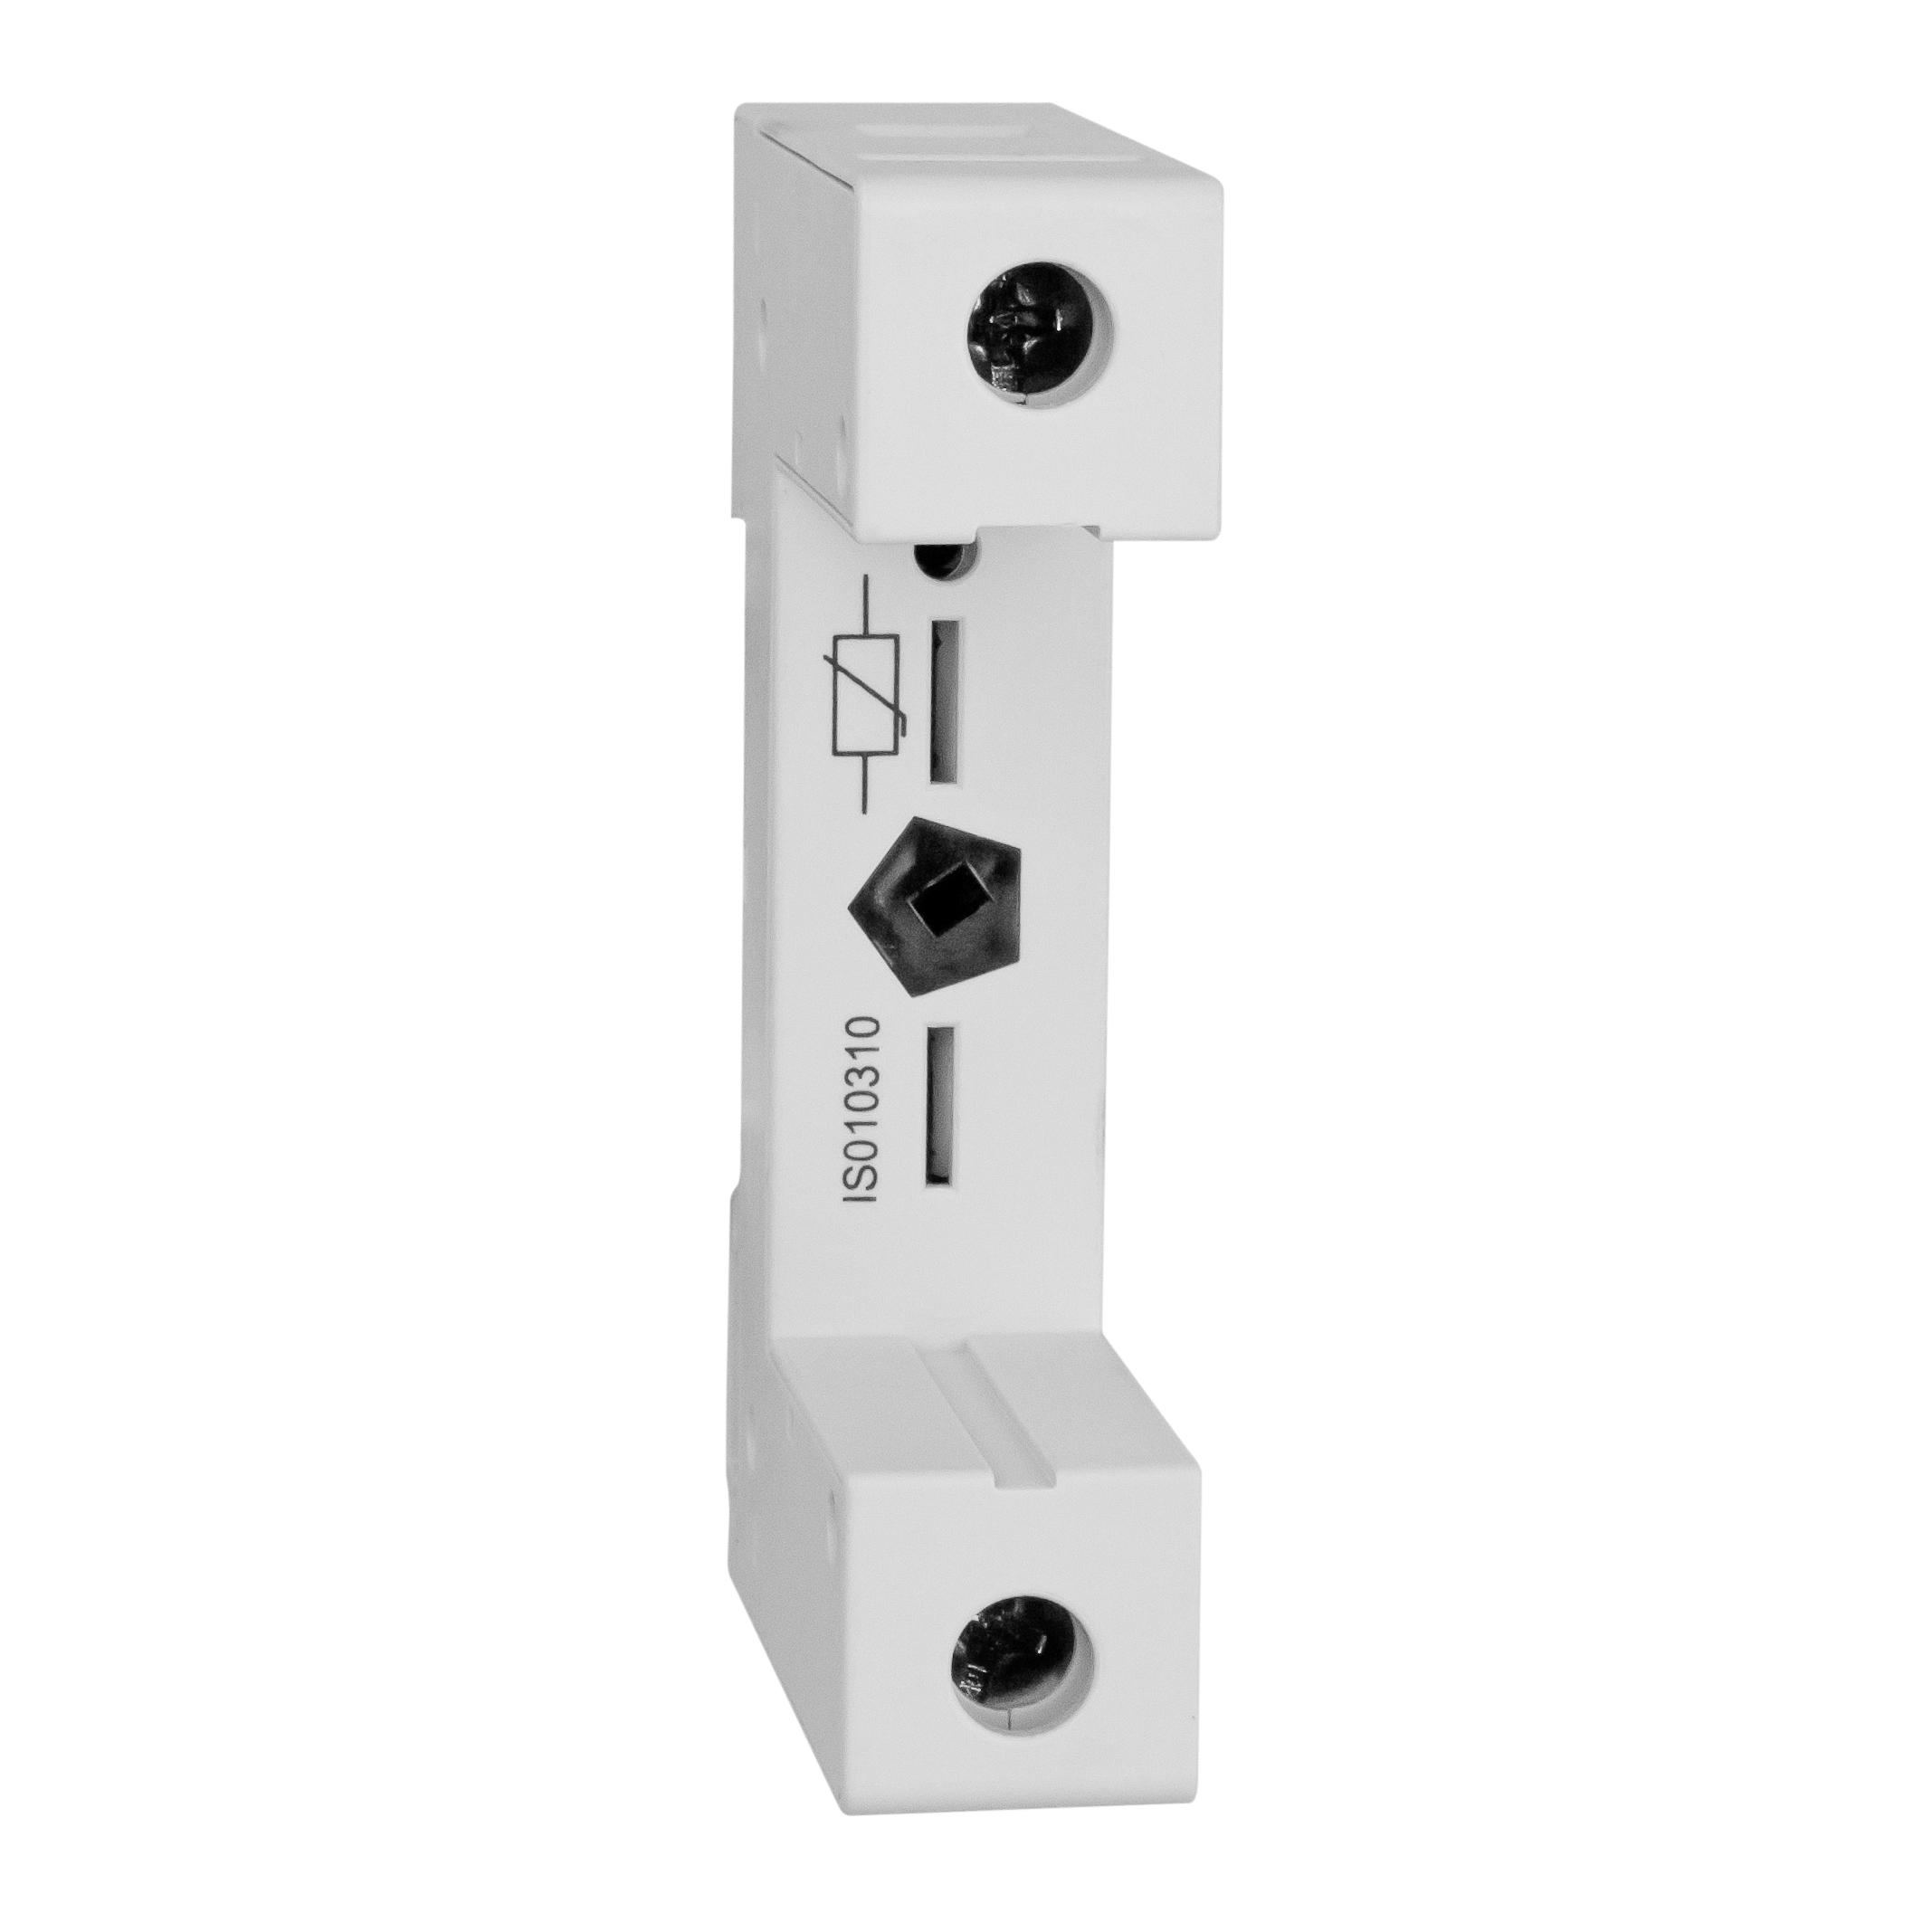 1 Stk Vartec T2, Sockel 1pol. für Varistor-Modul-Einsatz (VVM) IS010310--